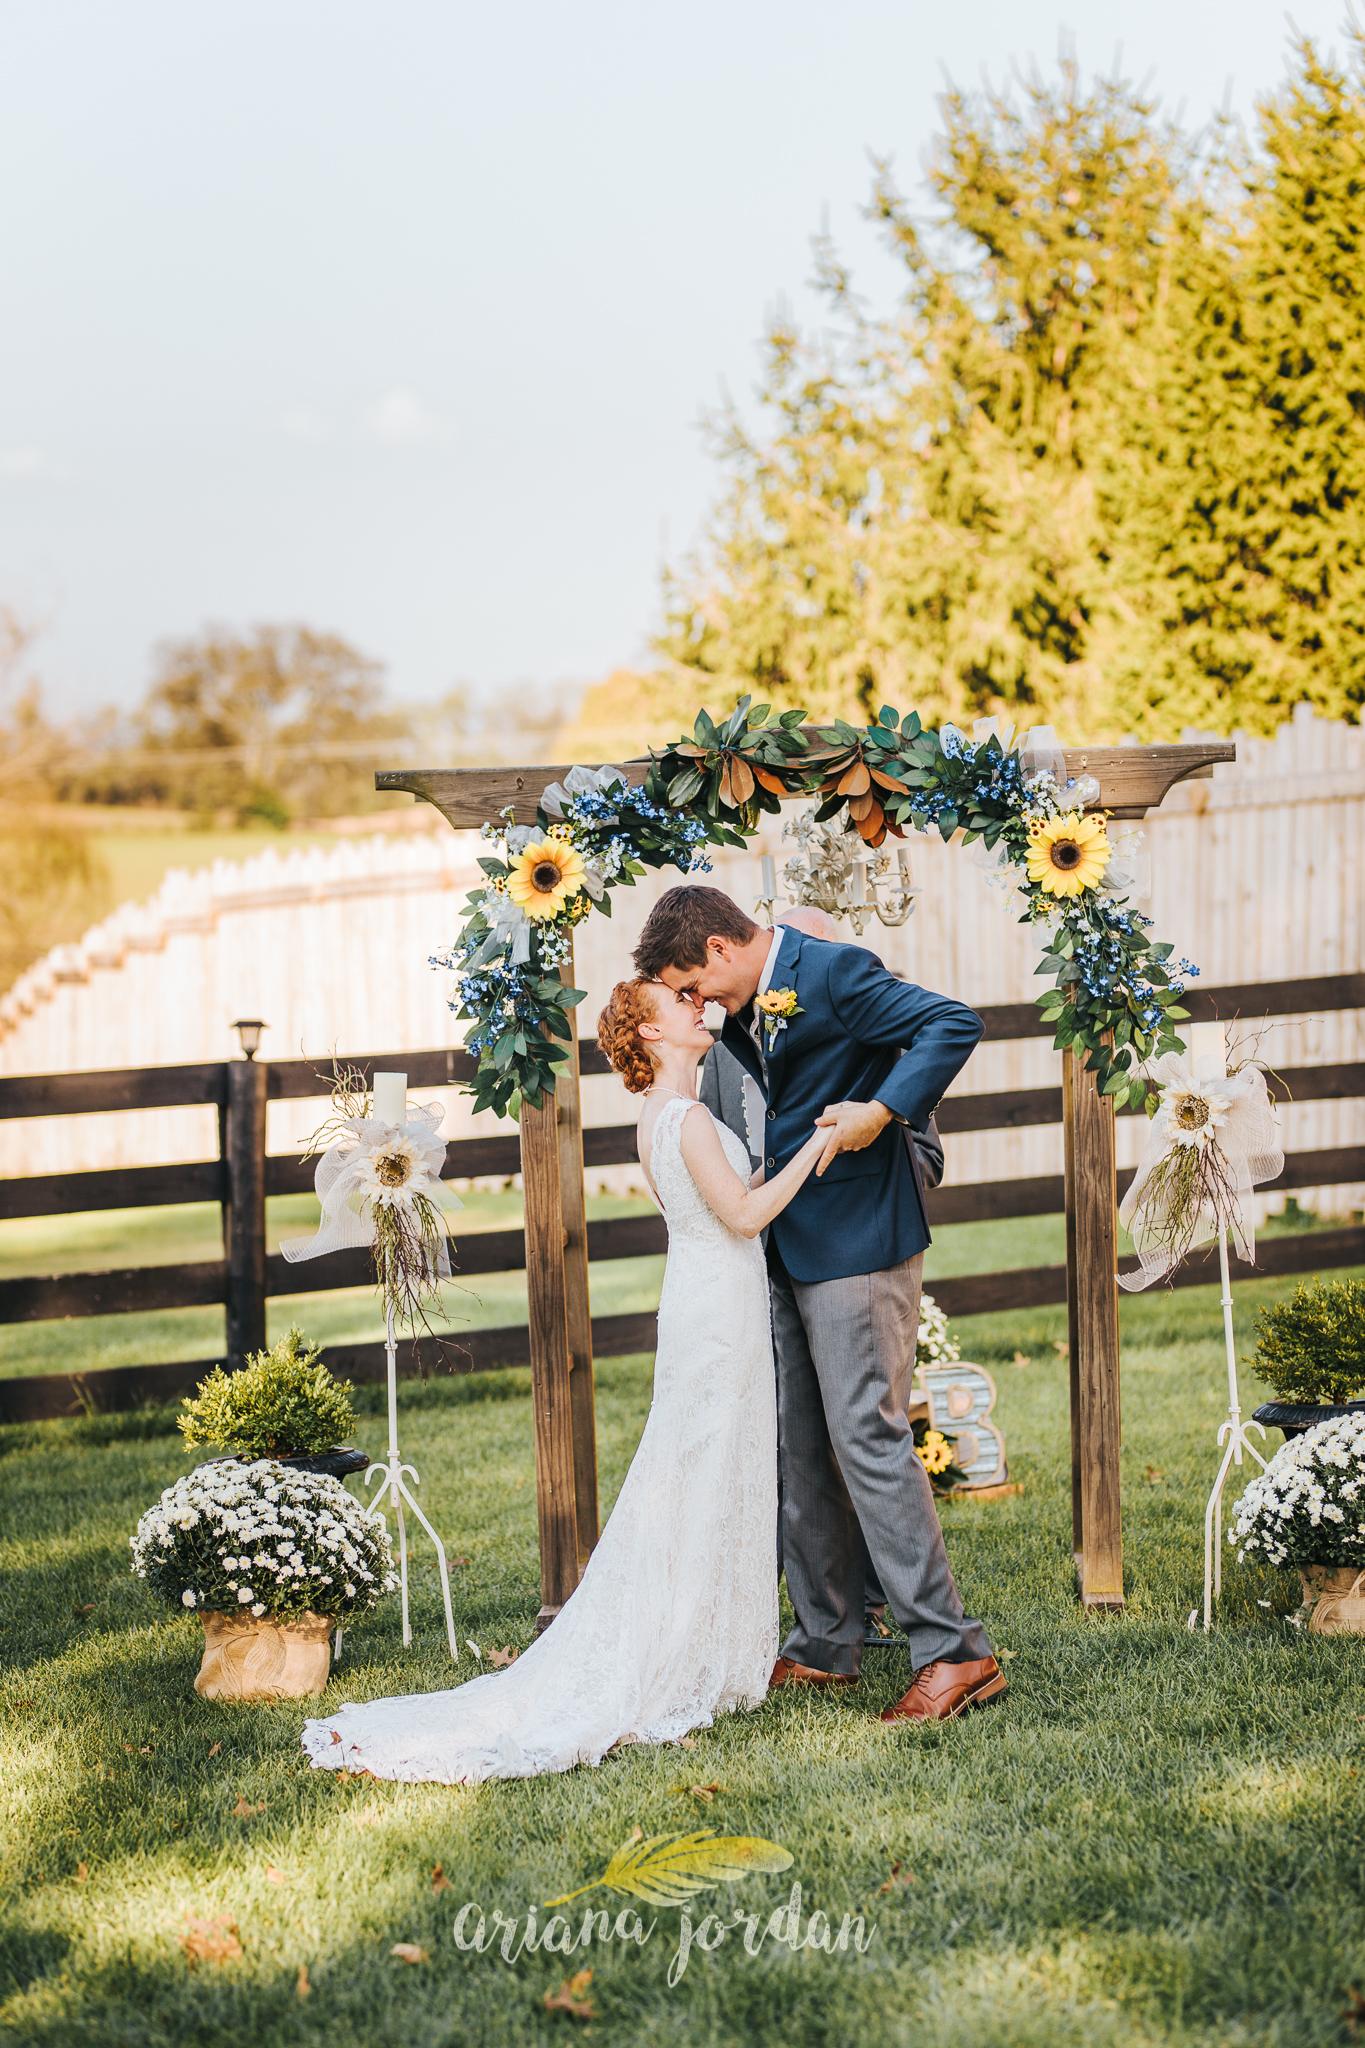 078 Ariana Jordan Photography -Moonlight Fields Lexington Ky Wedding Photographer 4689.jpg